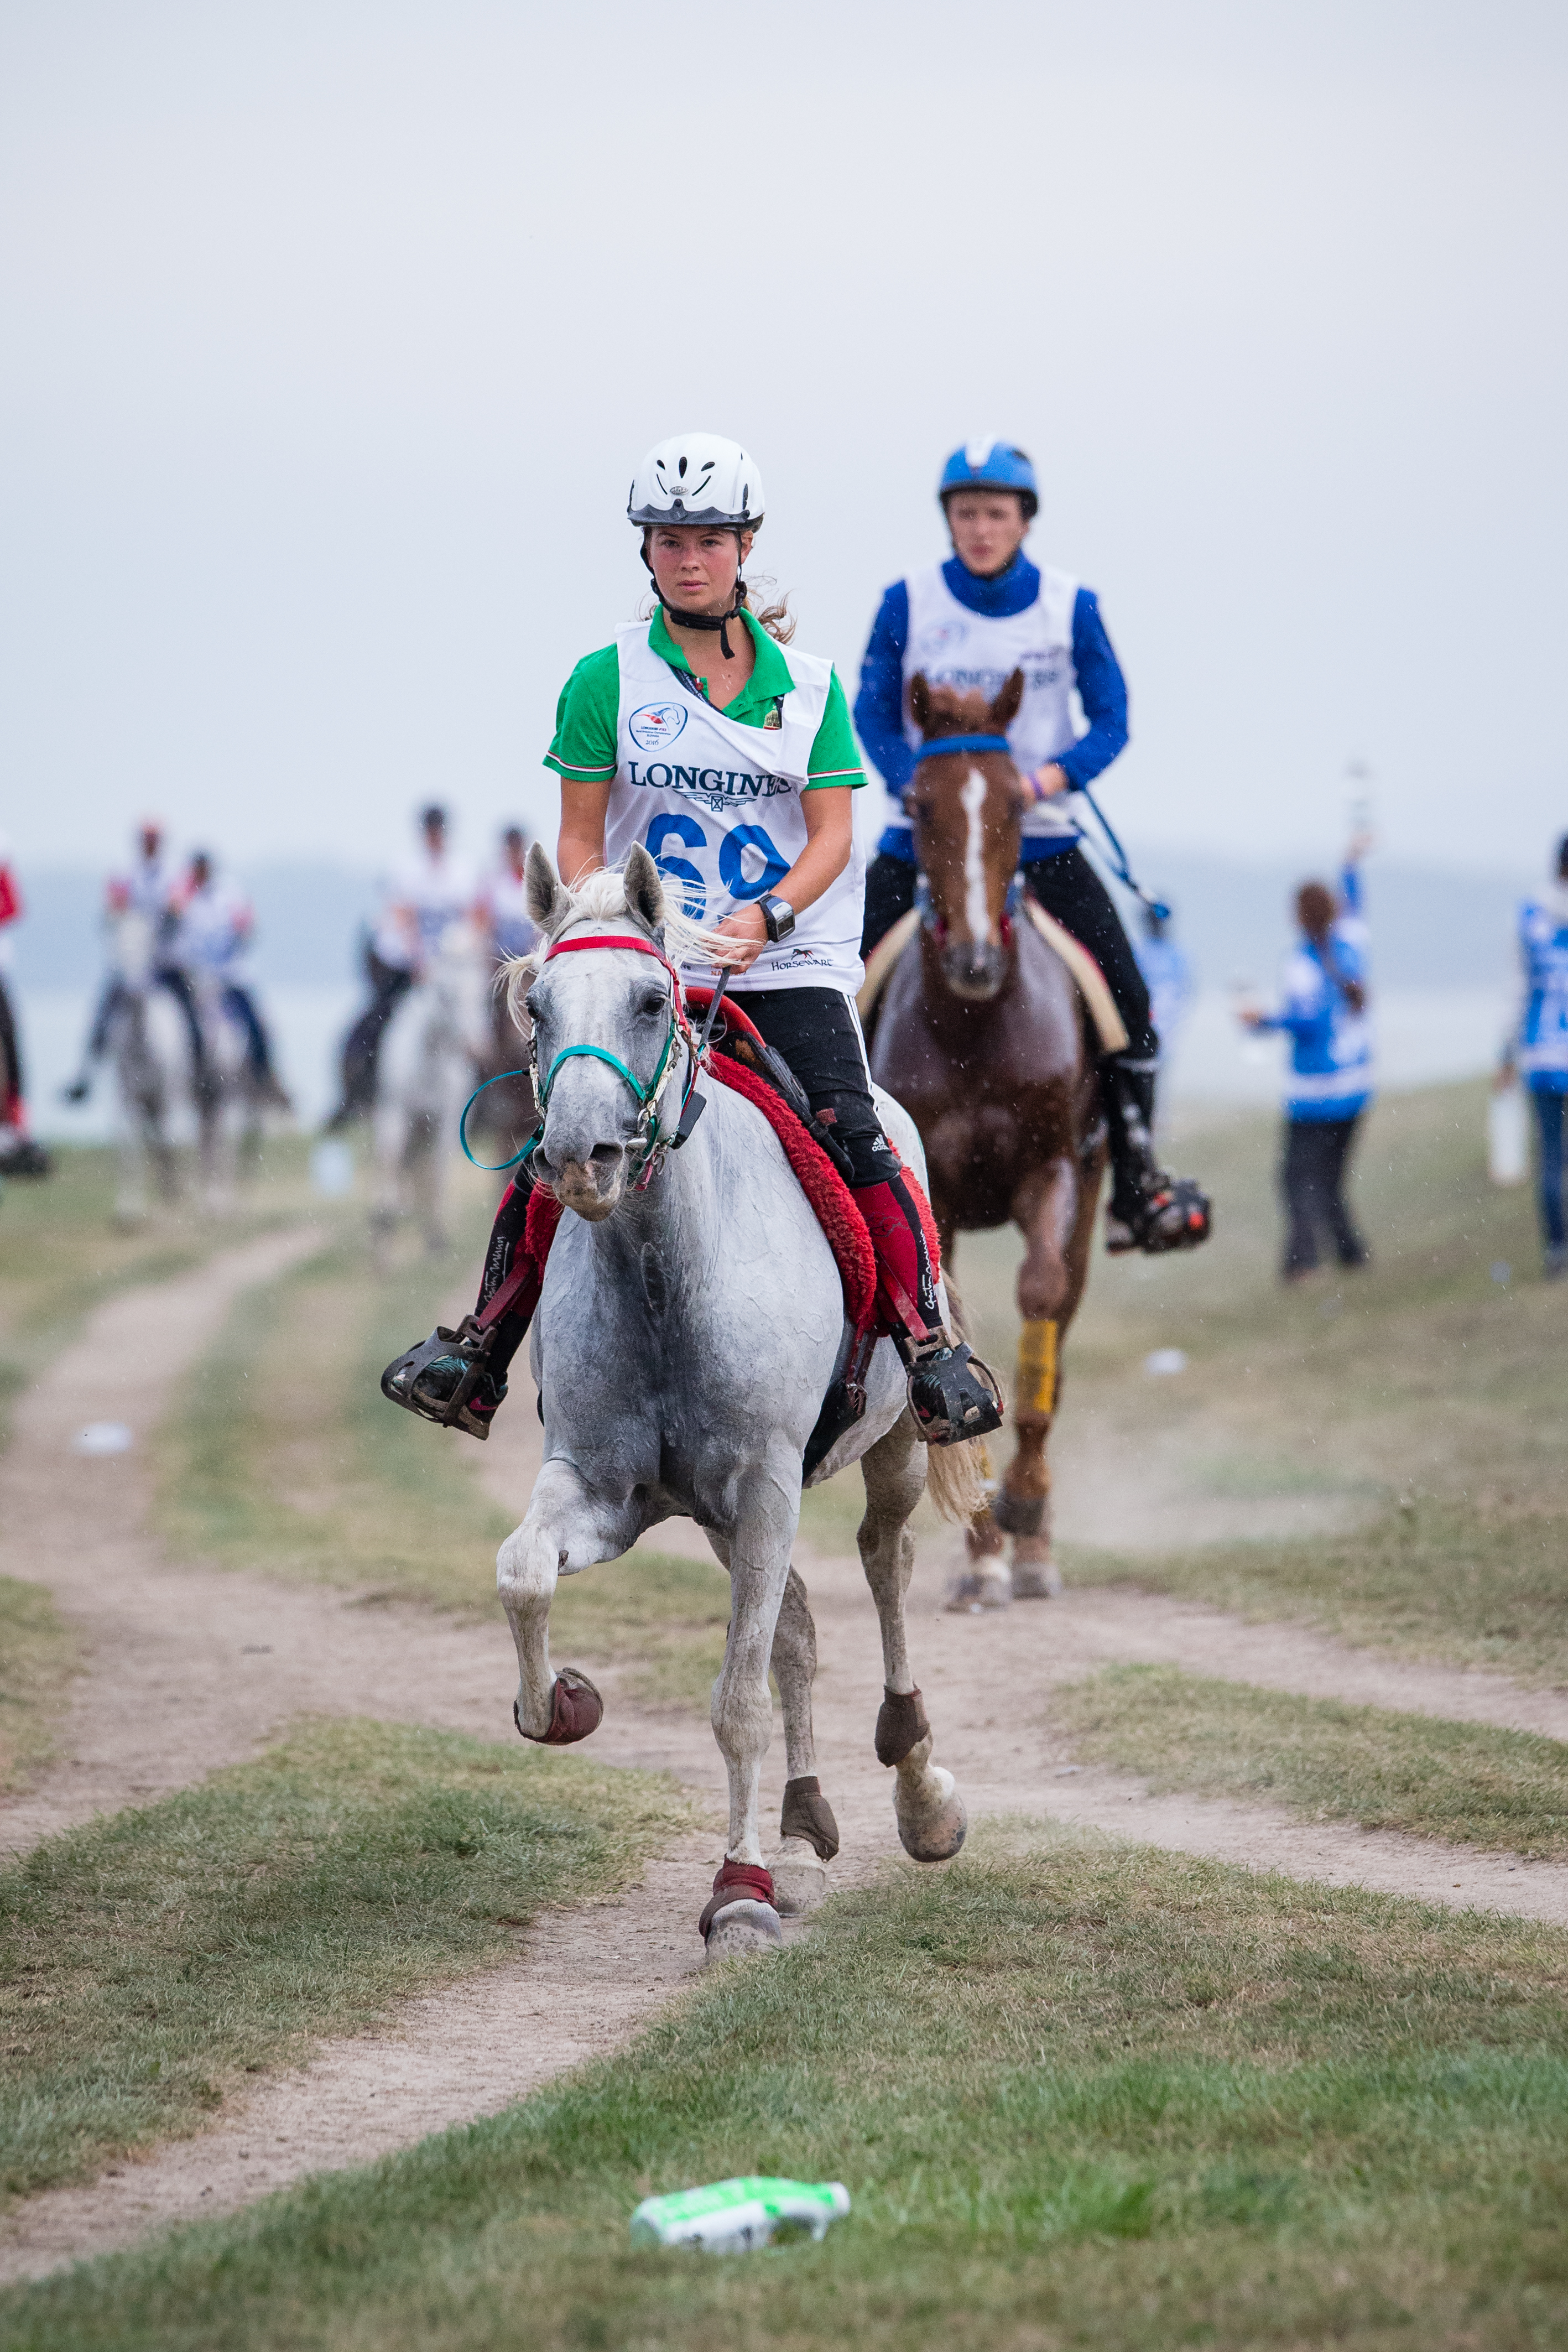 Photographie Eric KNOLL. Championnat du monde 2016 d'endurance. Samorin (Slovaquie)